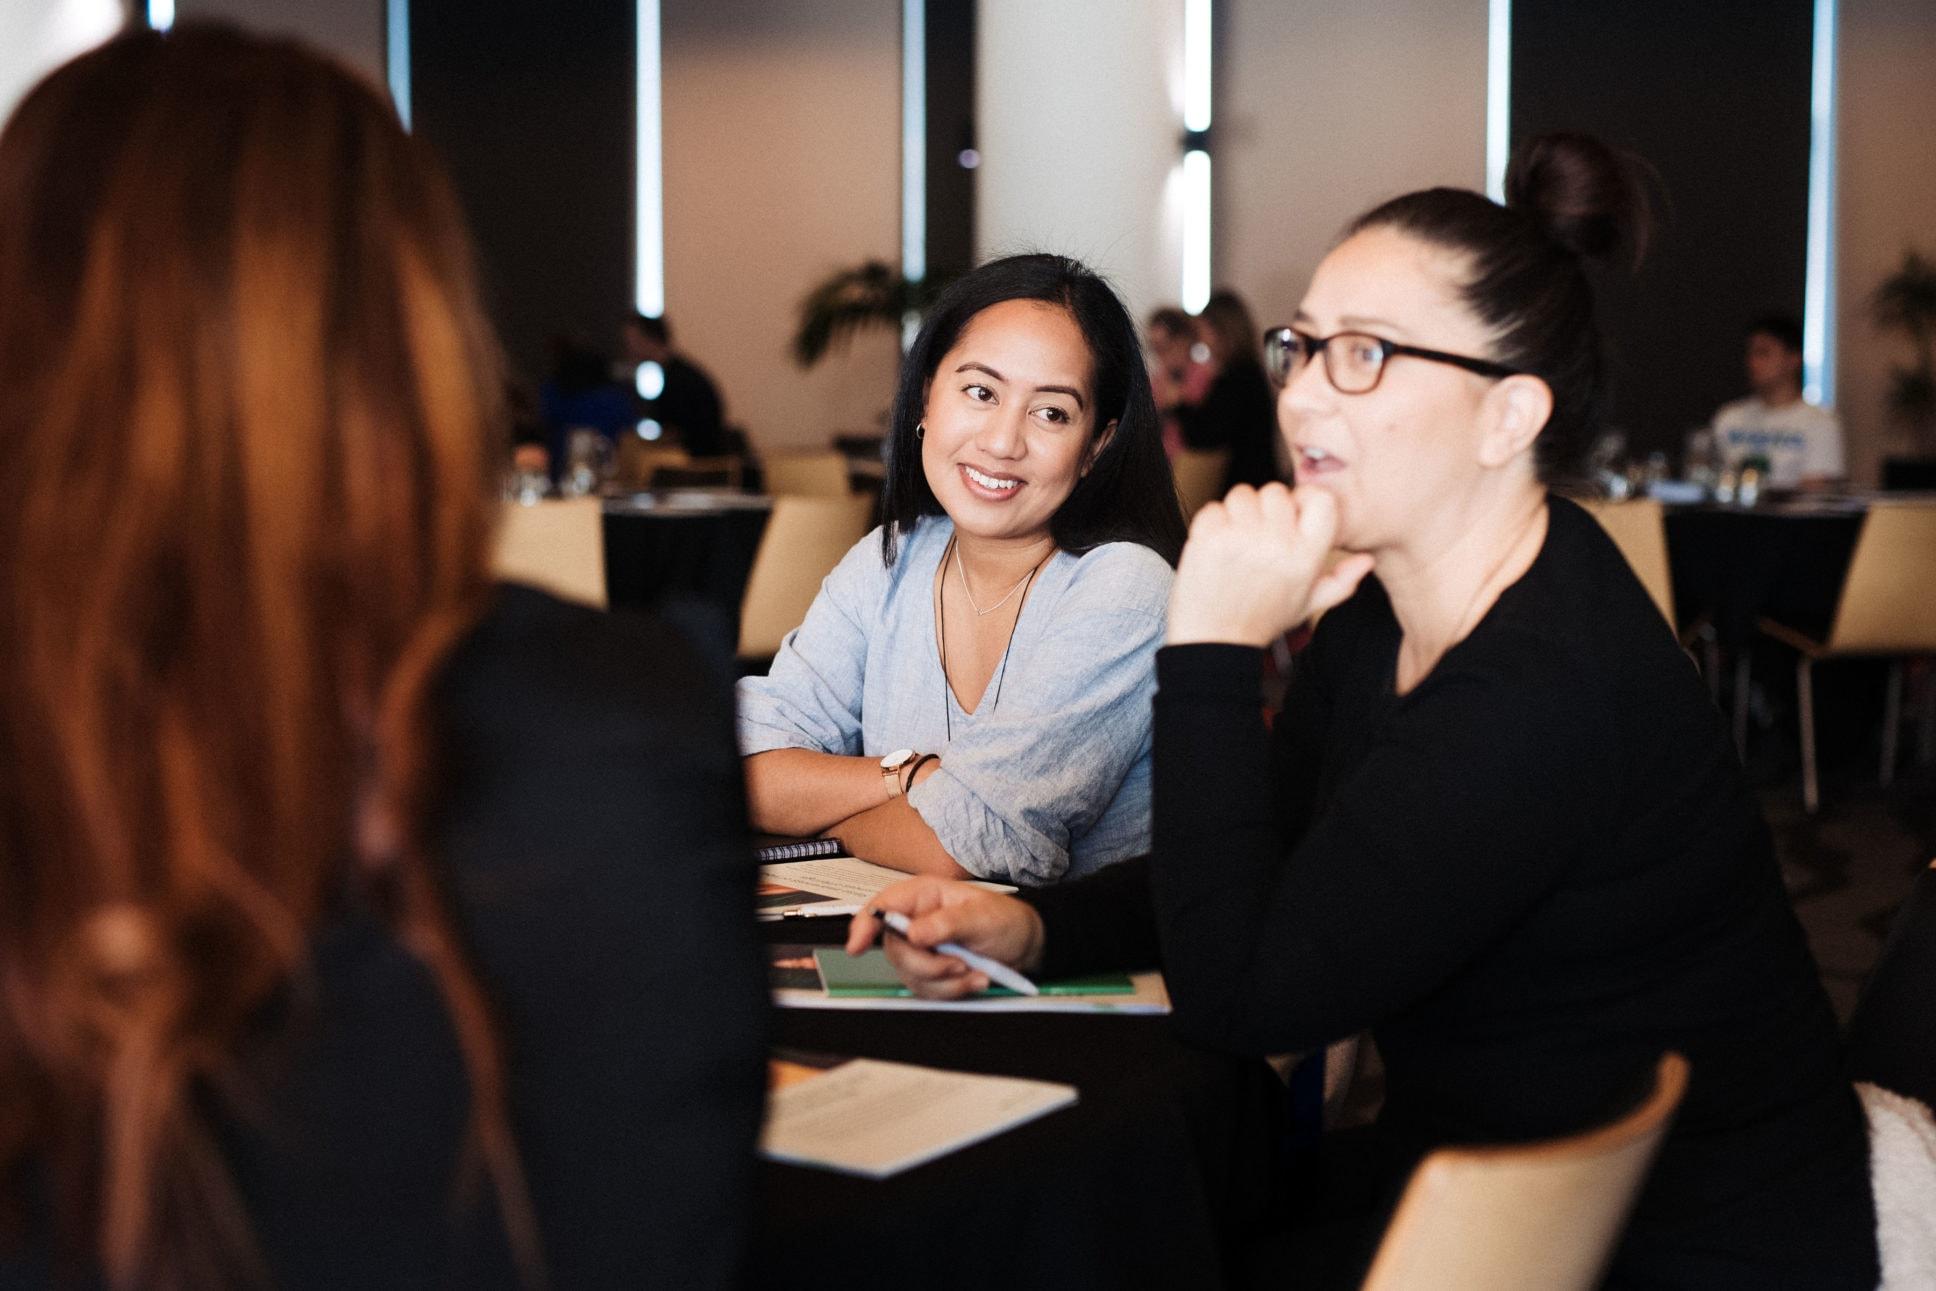 Women laughing at facebook workshop.